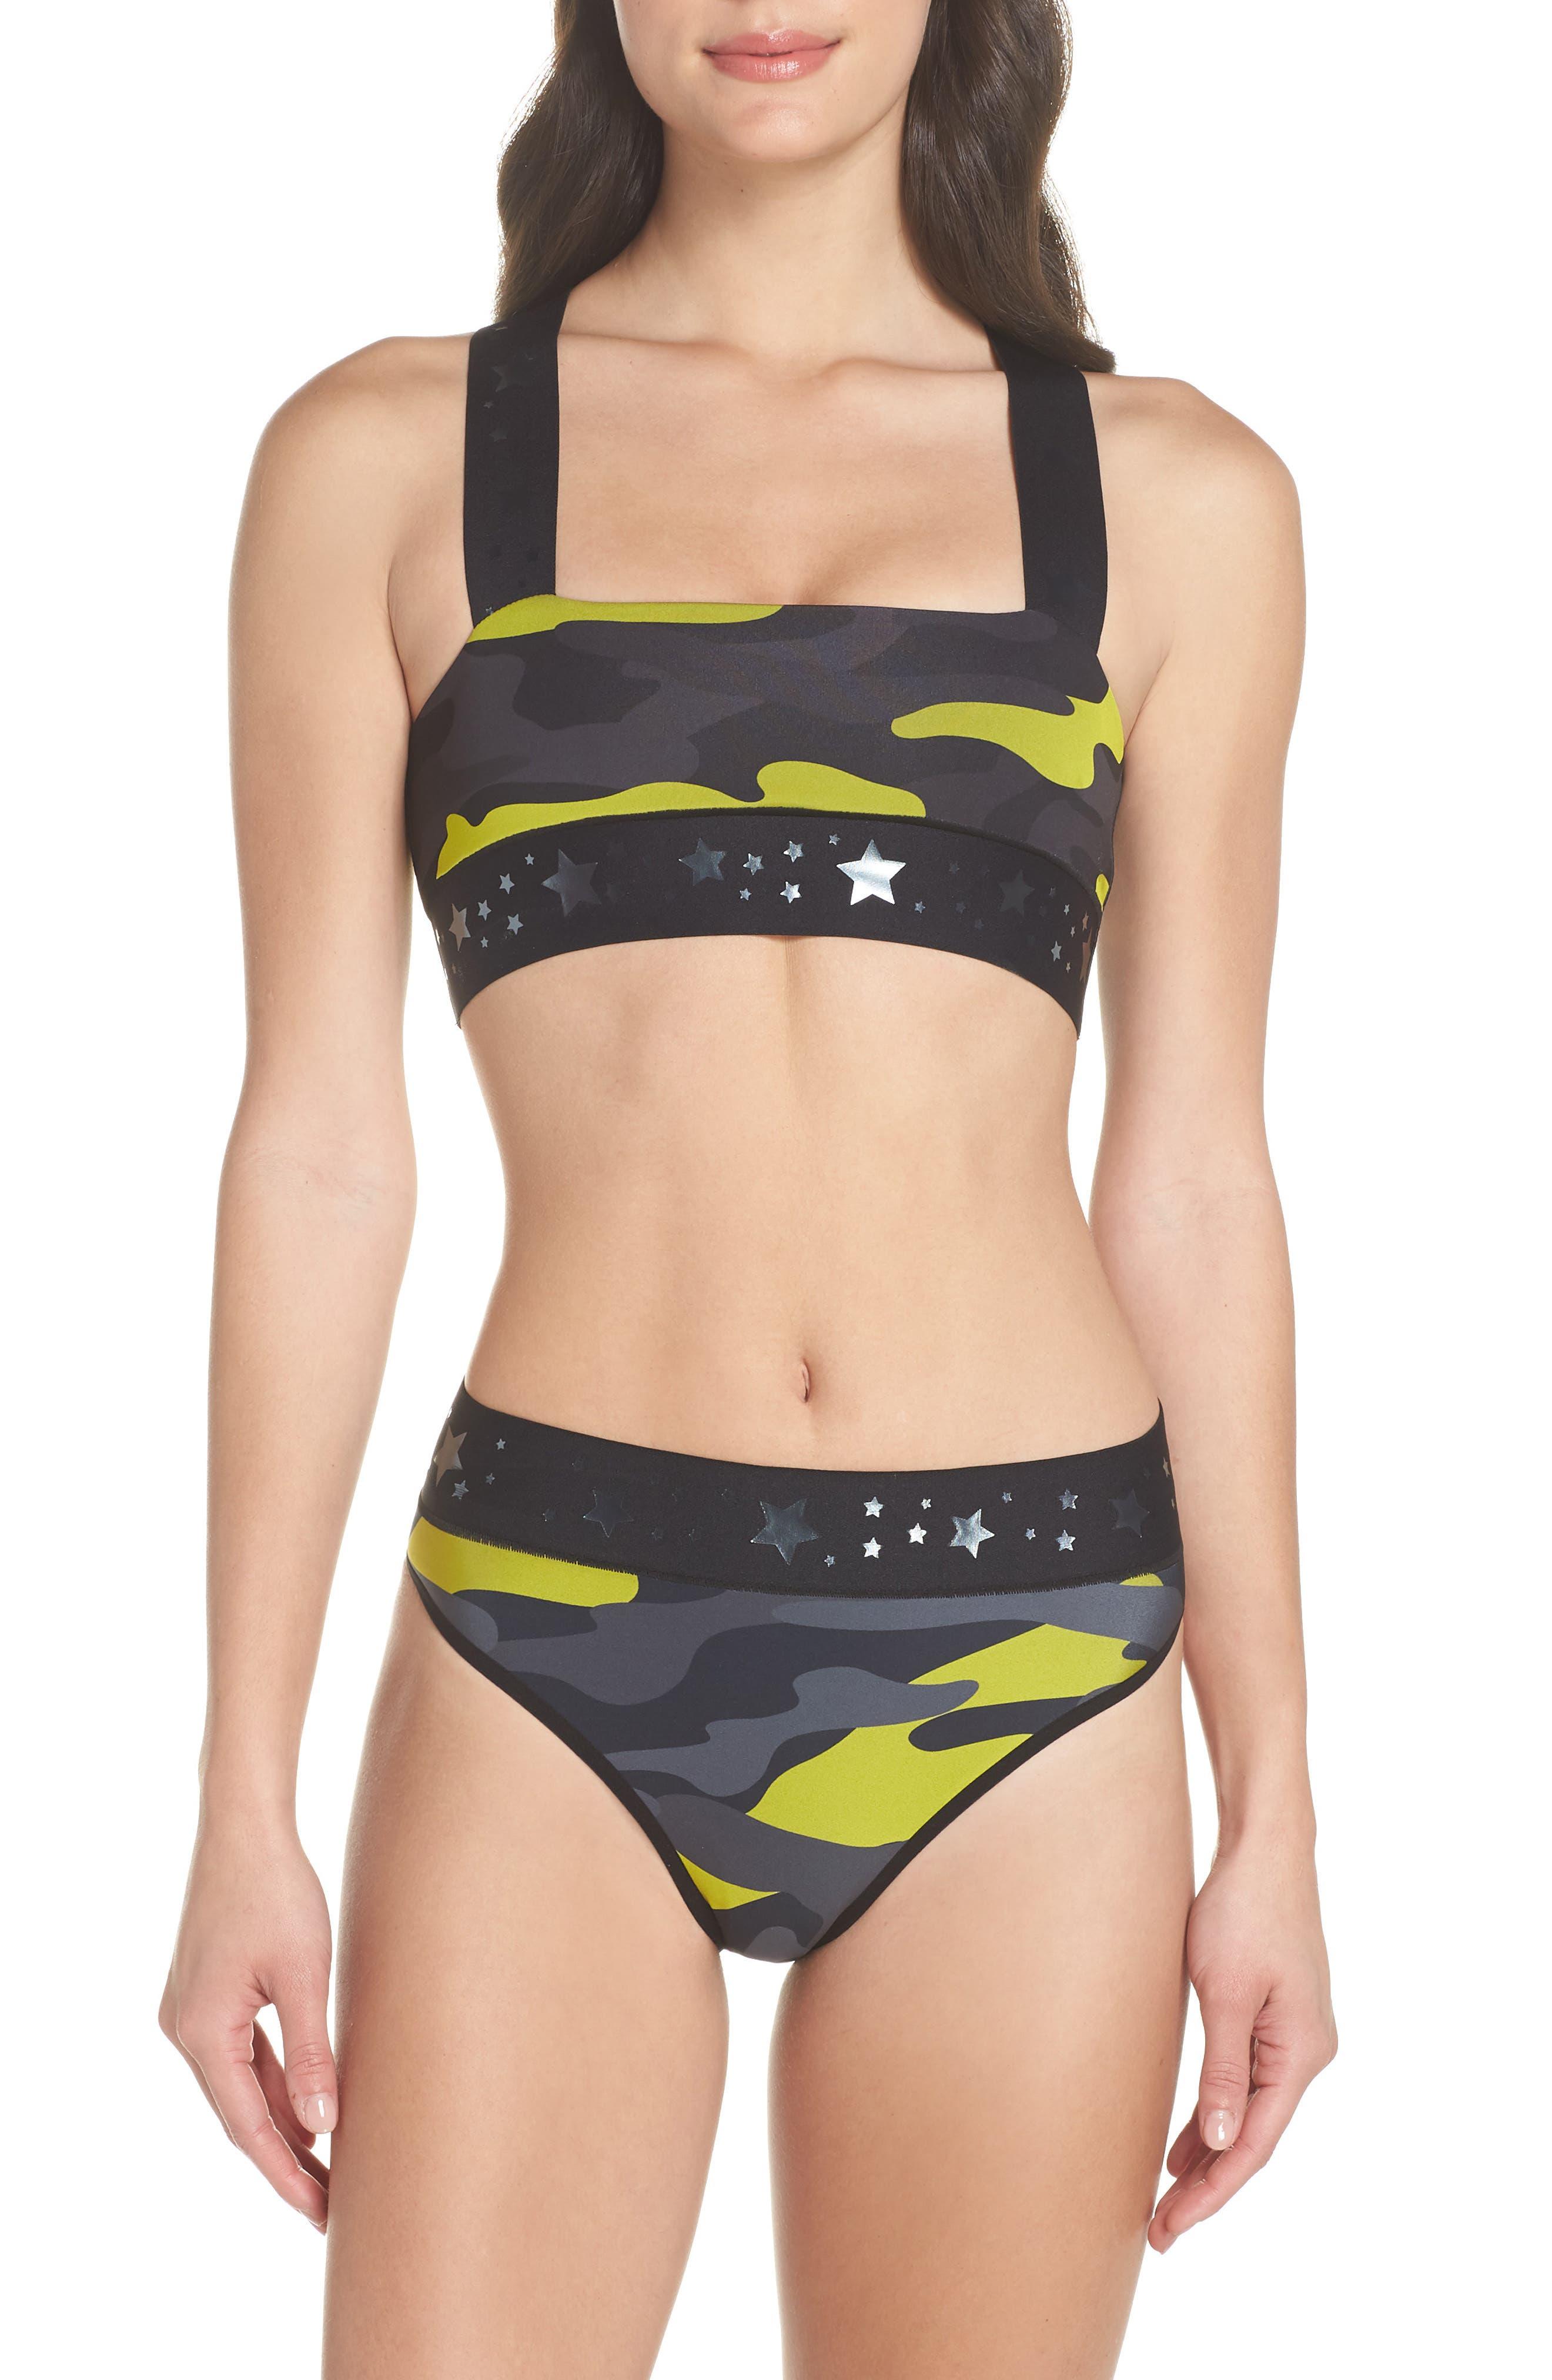 Argon Camo High Waist Bikini Bottoms,                             Alternate thumbnail 7, color,                             Chartreuse Gunmetal